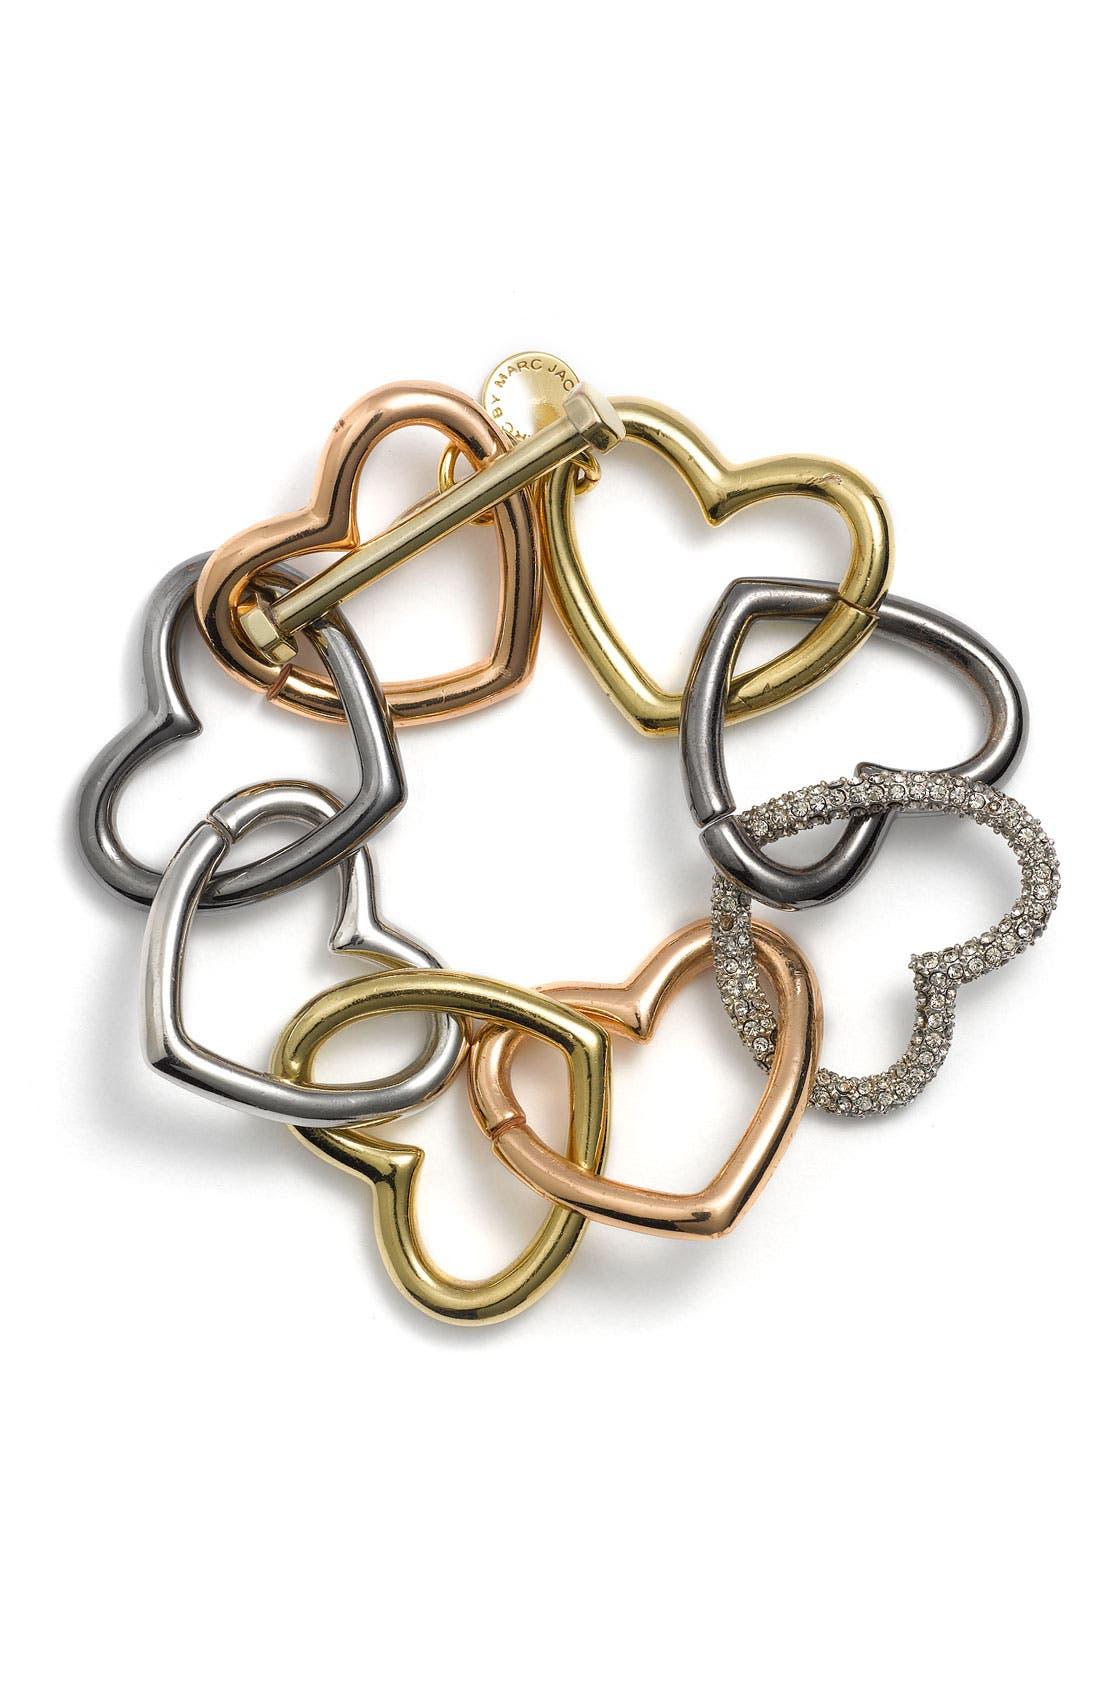 Main Image - MARC BY MARC JACOBS 'Love Edge' Heart Bracelet